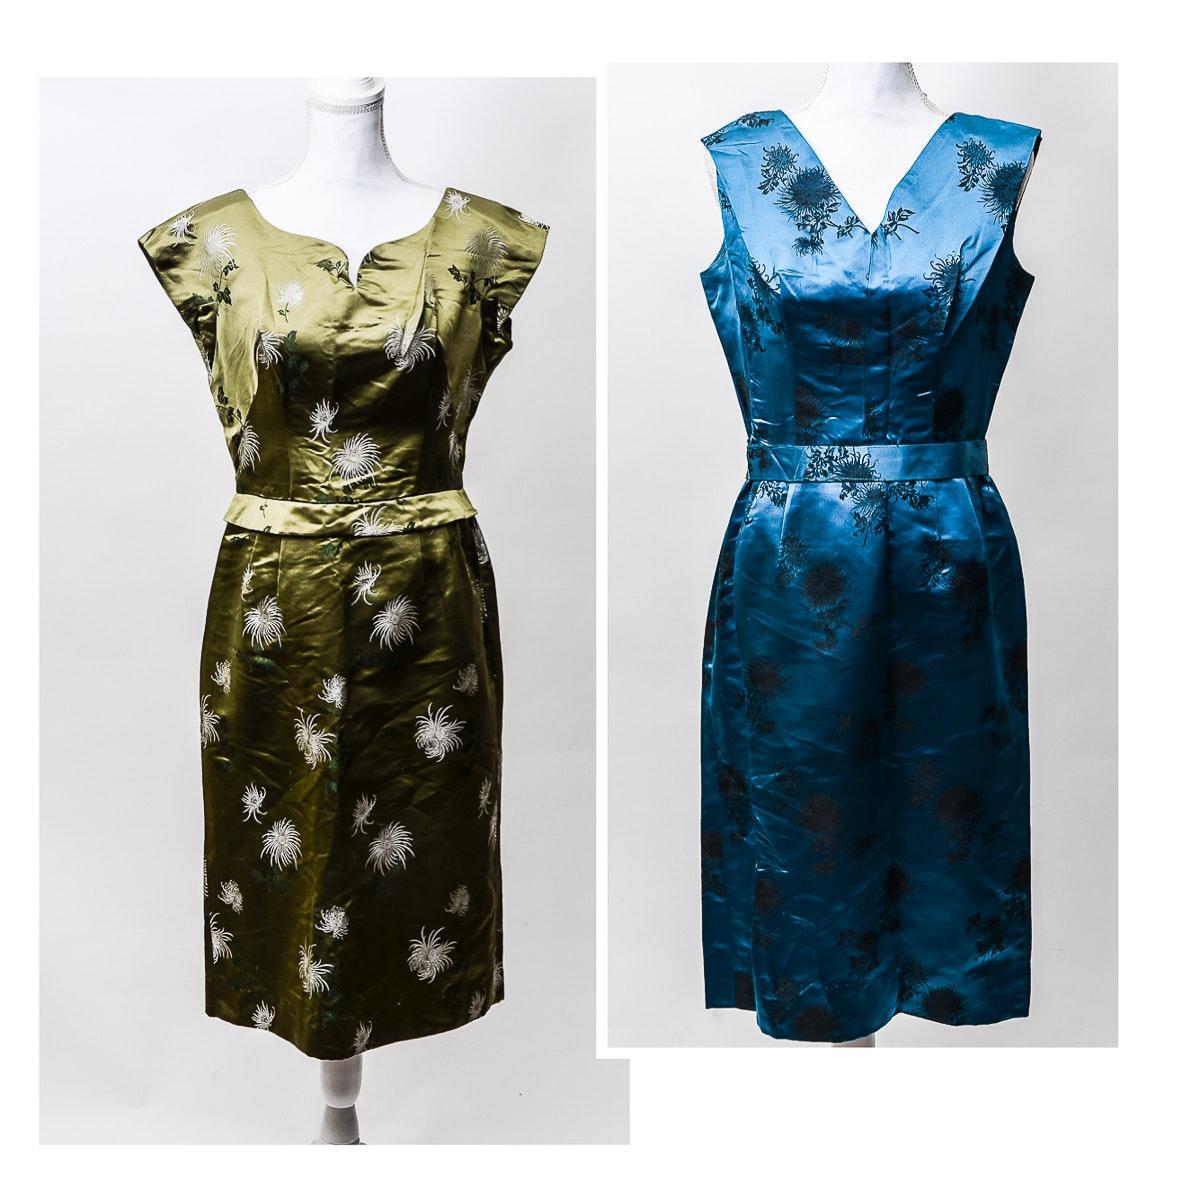 Vintage Fou Wah Chinese Dresses